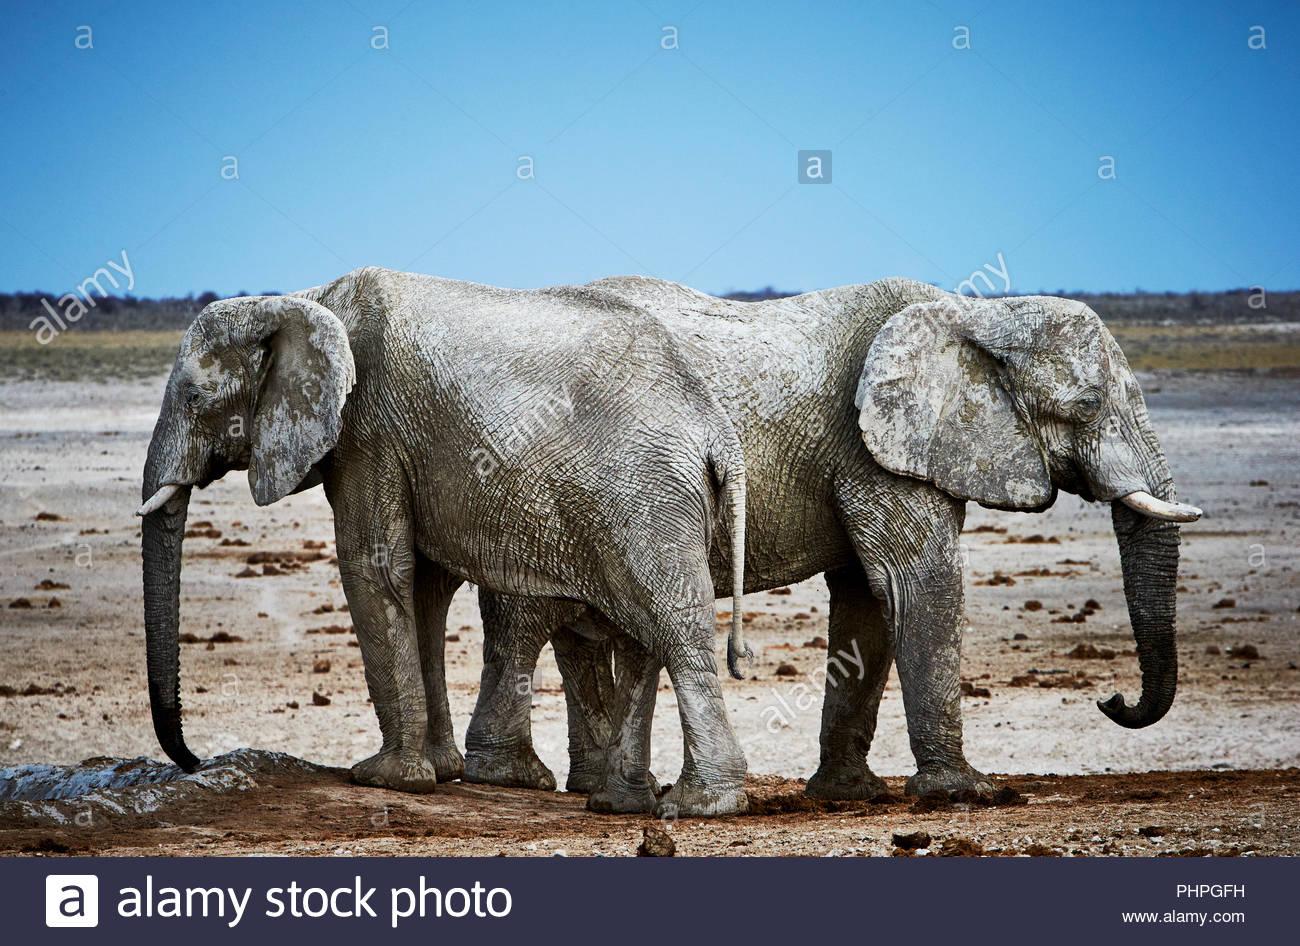 Gli elefanti africani coperti di fango Immagini Stock